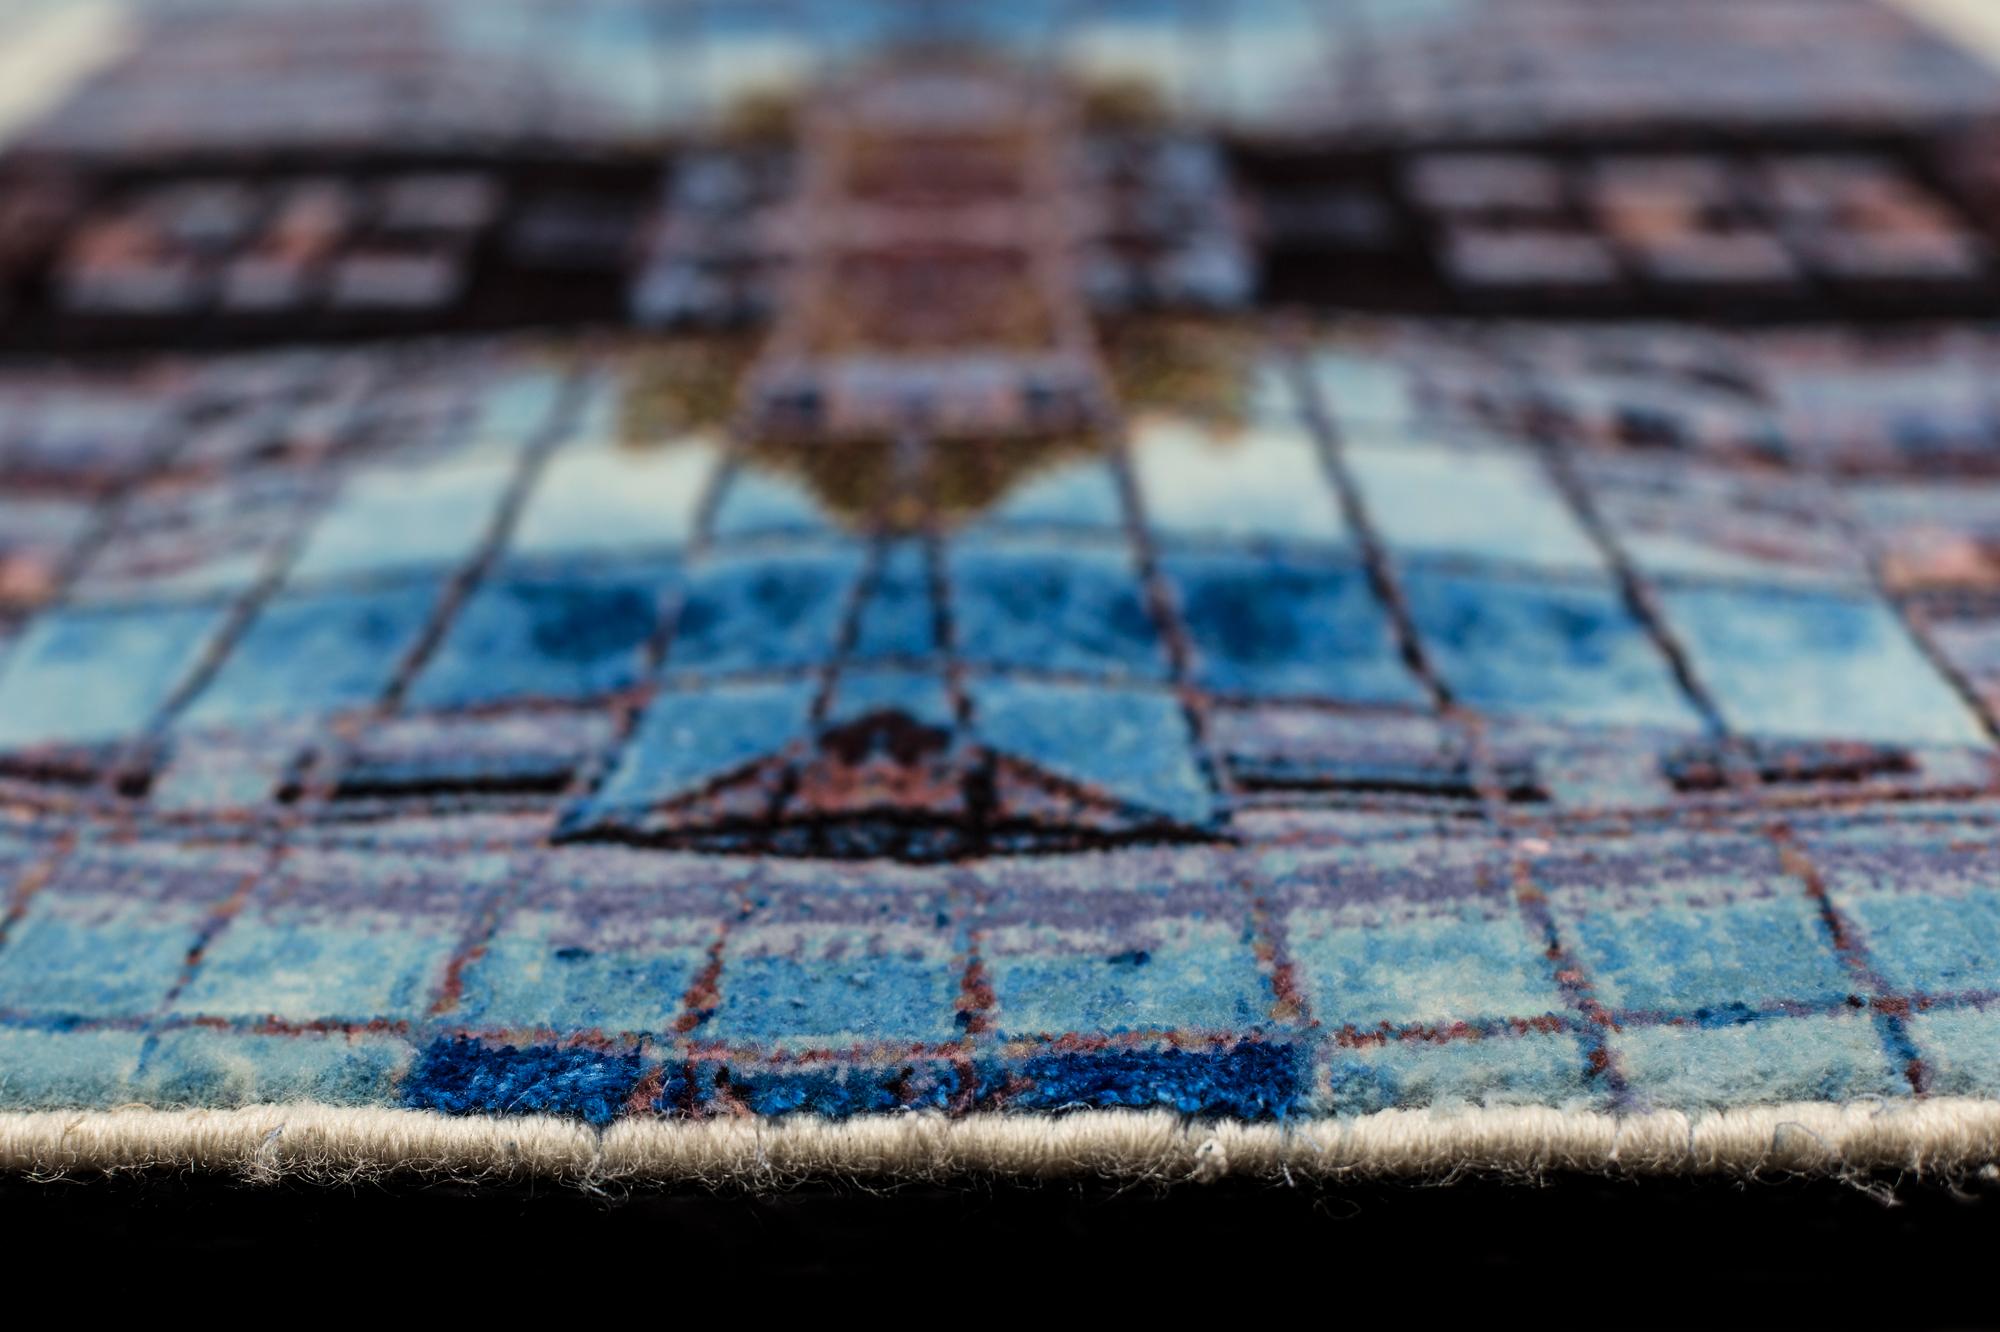 AmirBECH-TheWovenPhotographFront-Detail4941.jpg